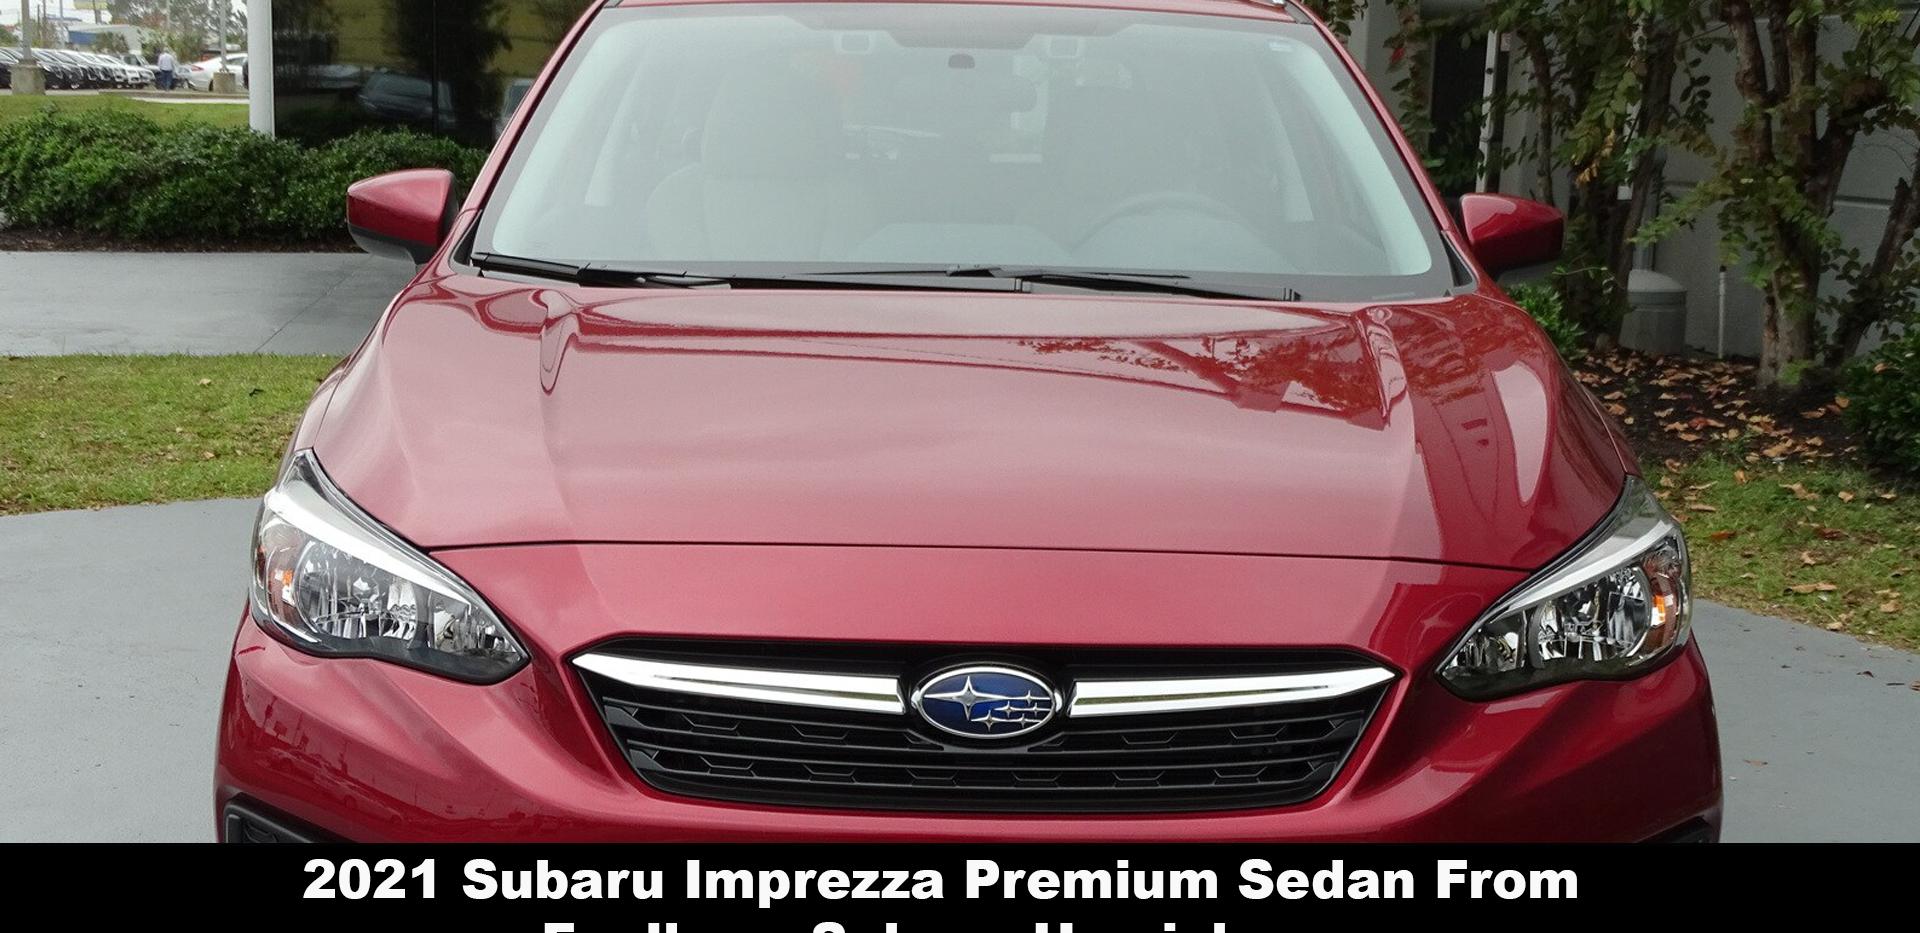 2021 Subaru Imprezza Premium Sedan